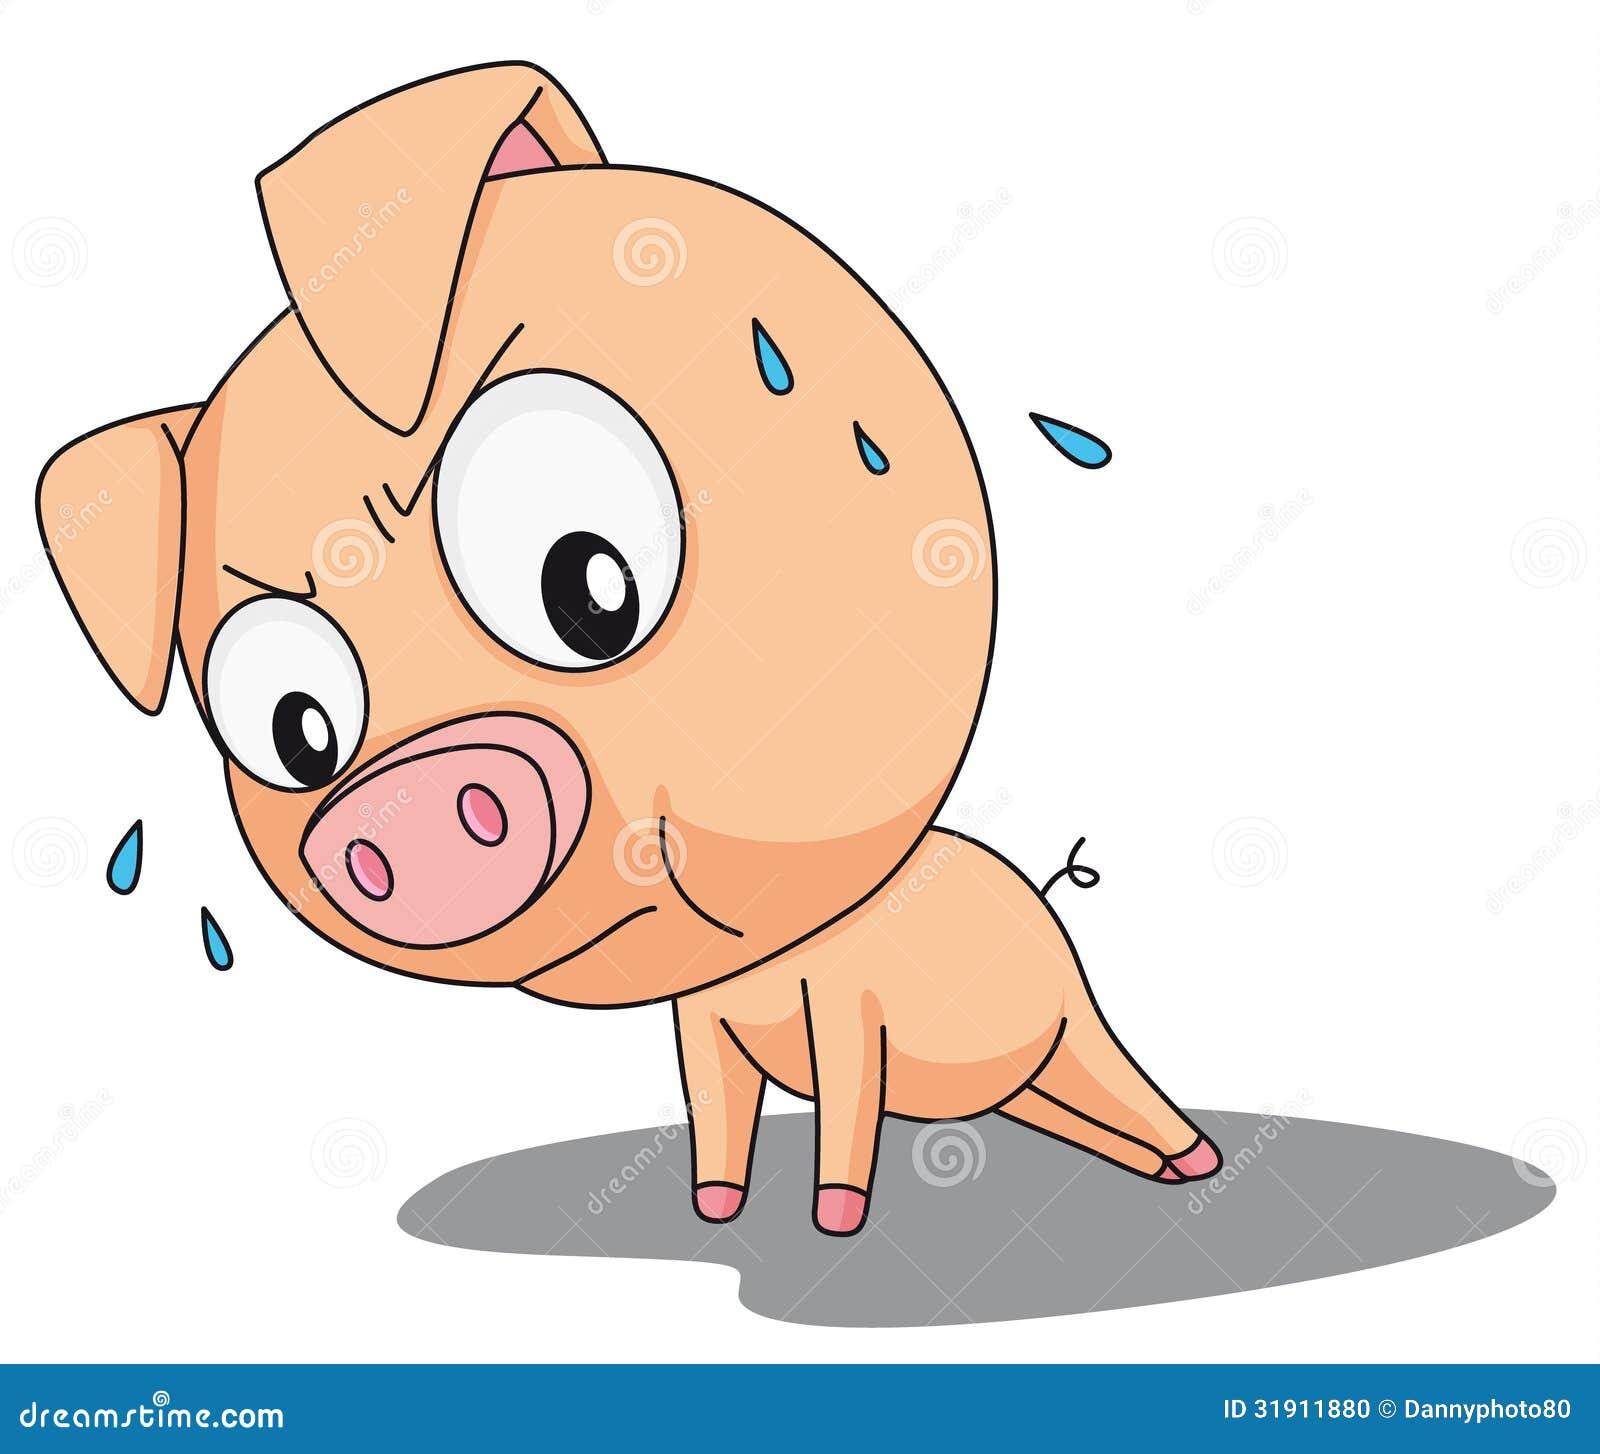 clip art funny pigs - photo #7